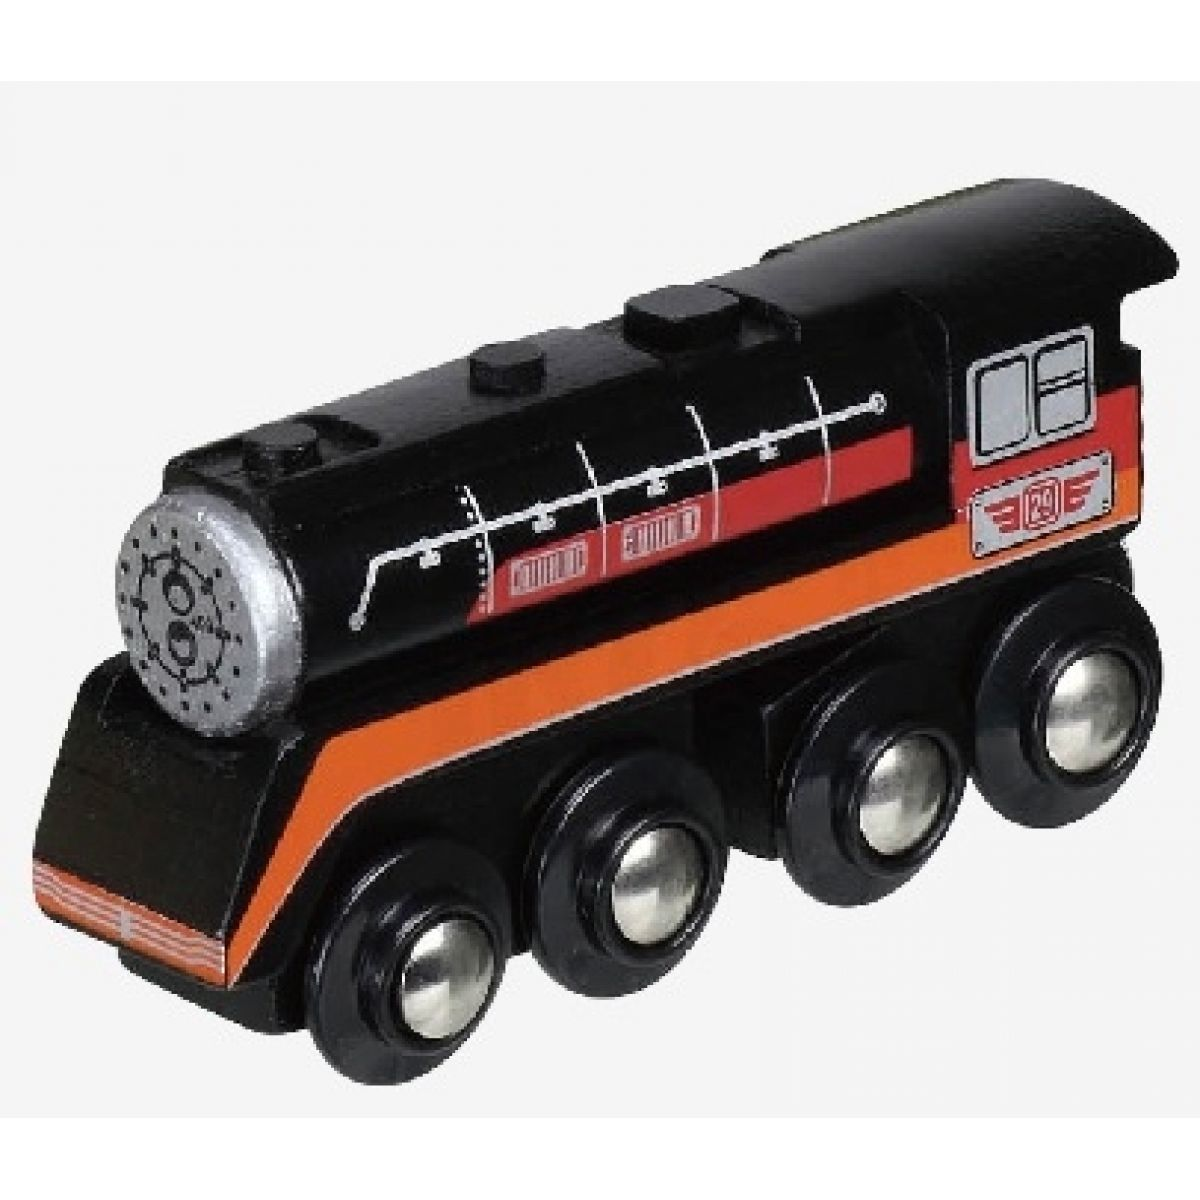 Parní lokomotiva Epocha MAXIM 50504